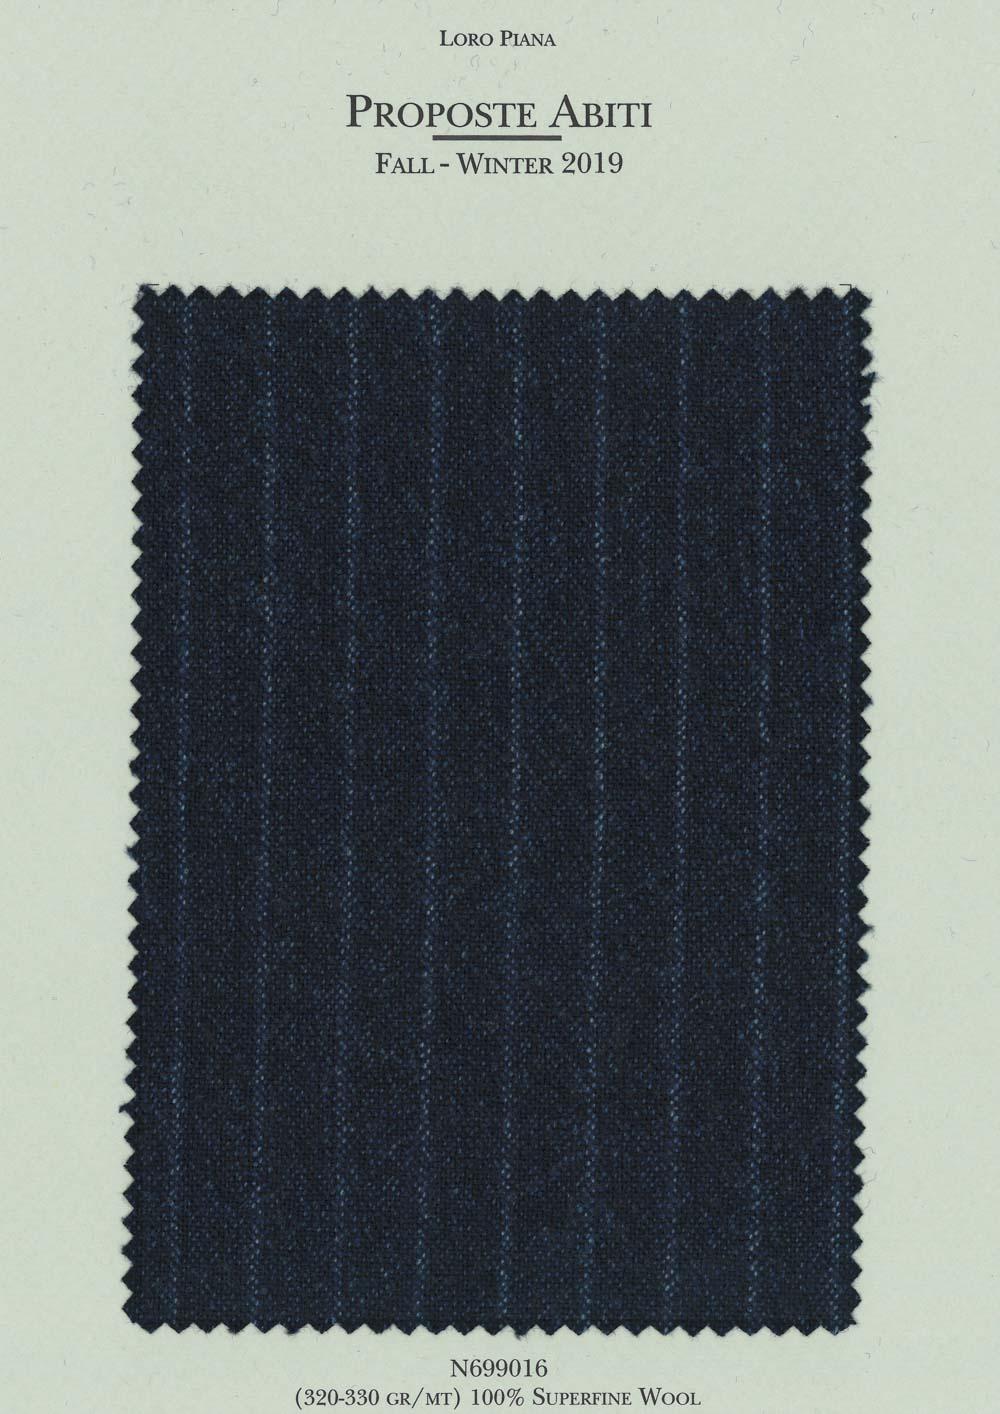 Lpn699016